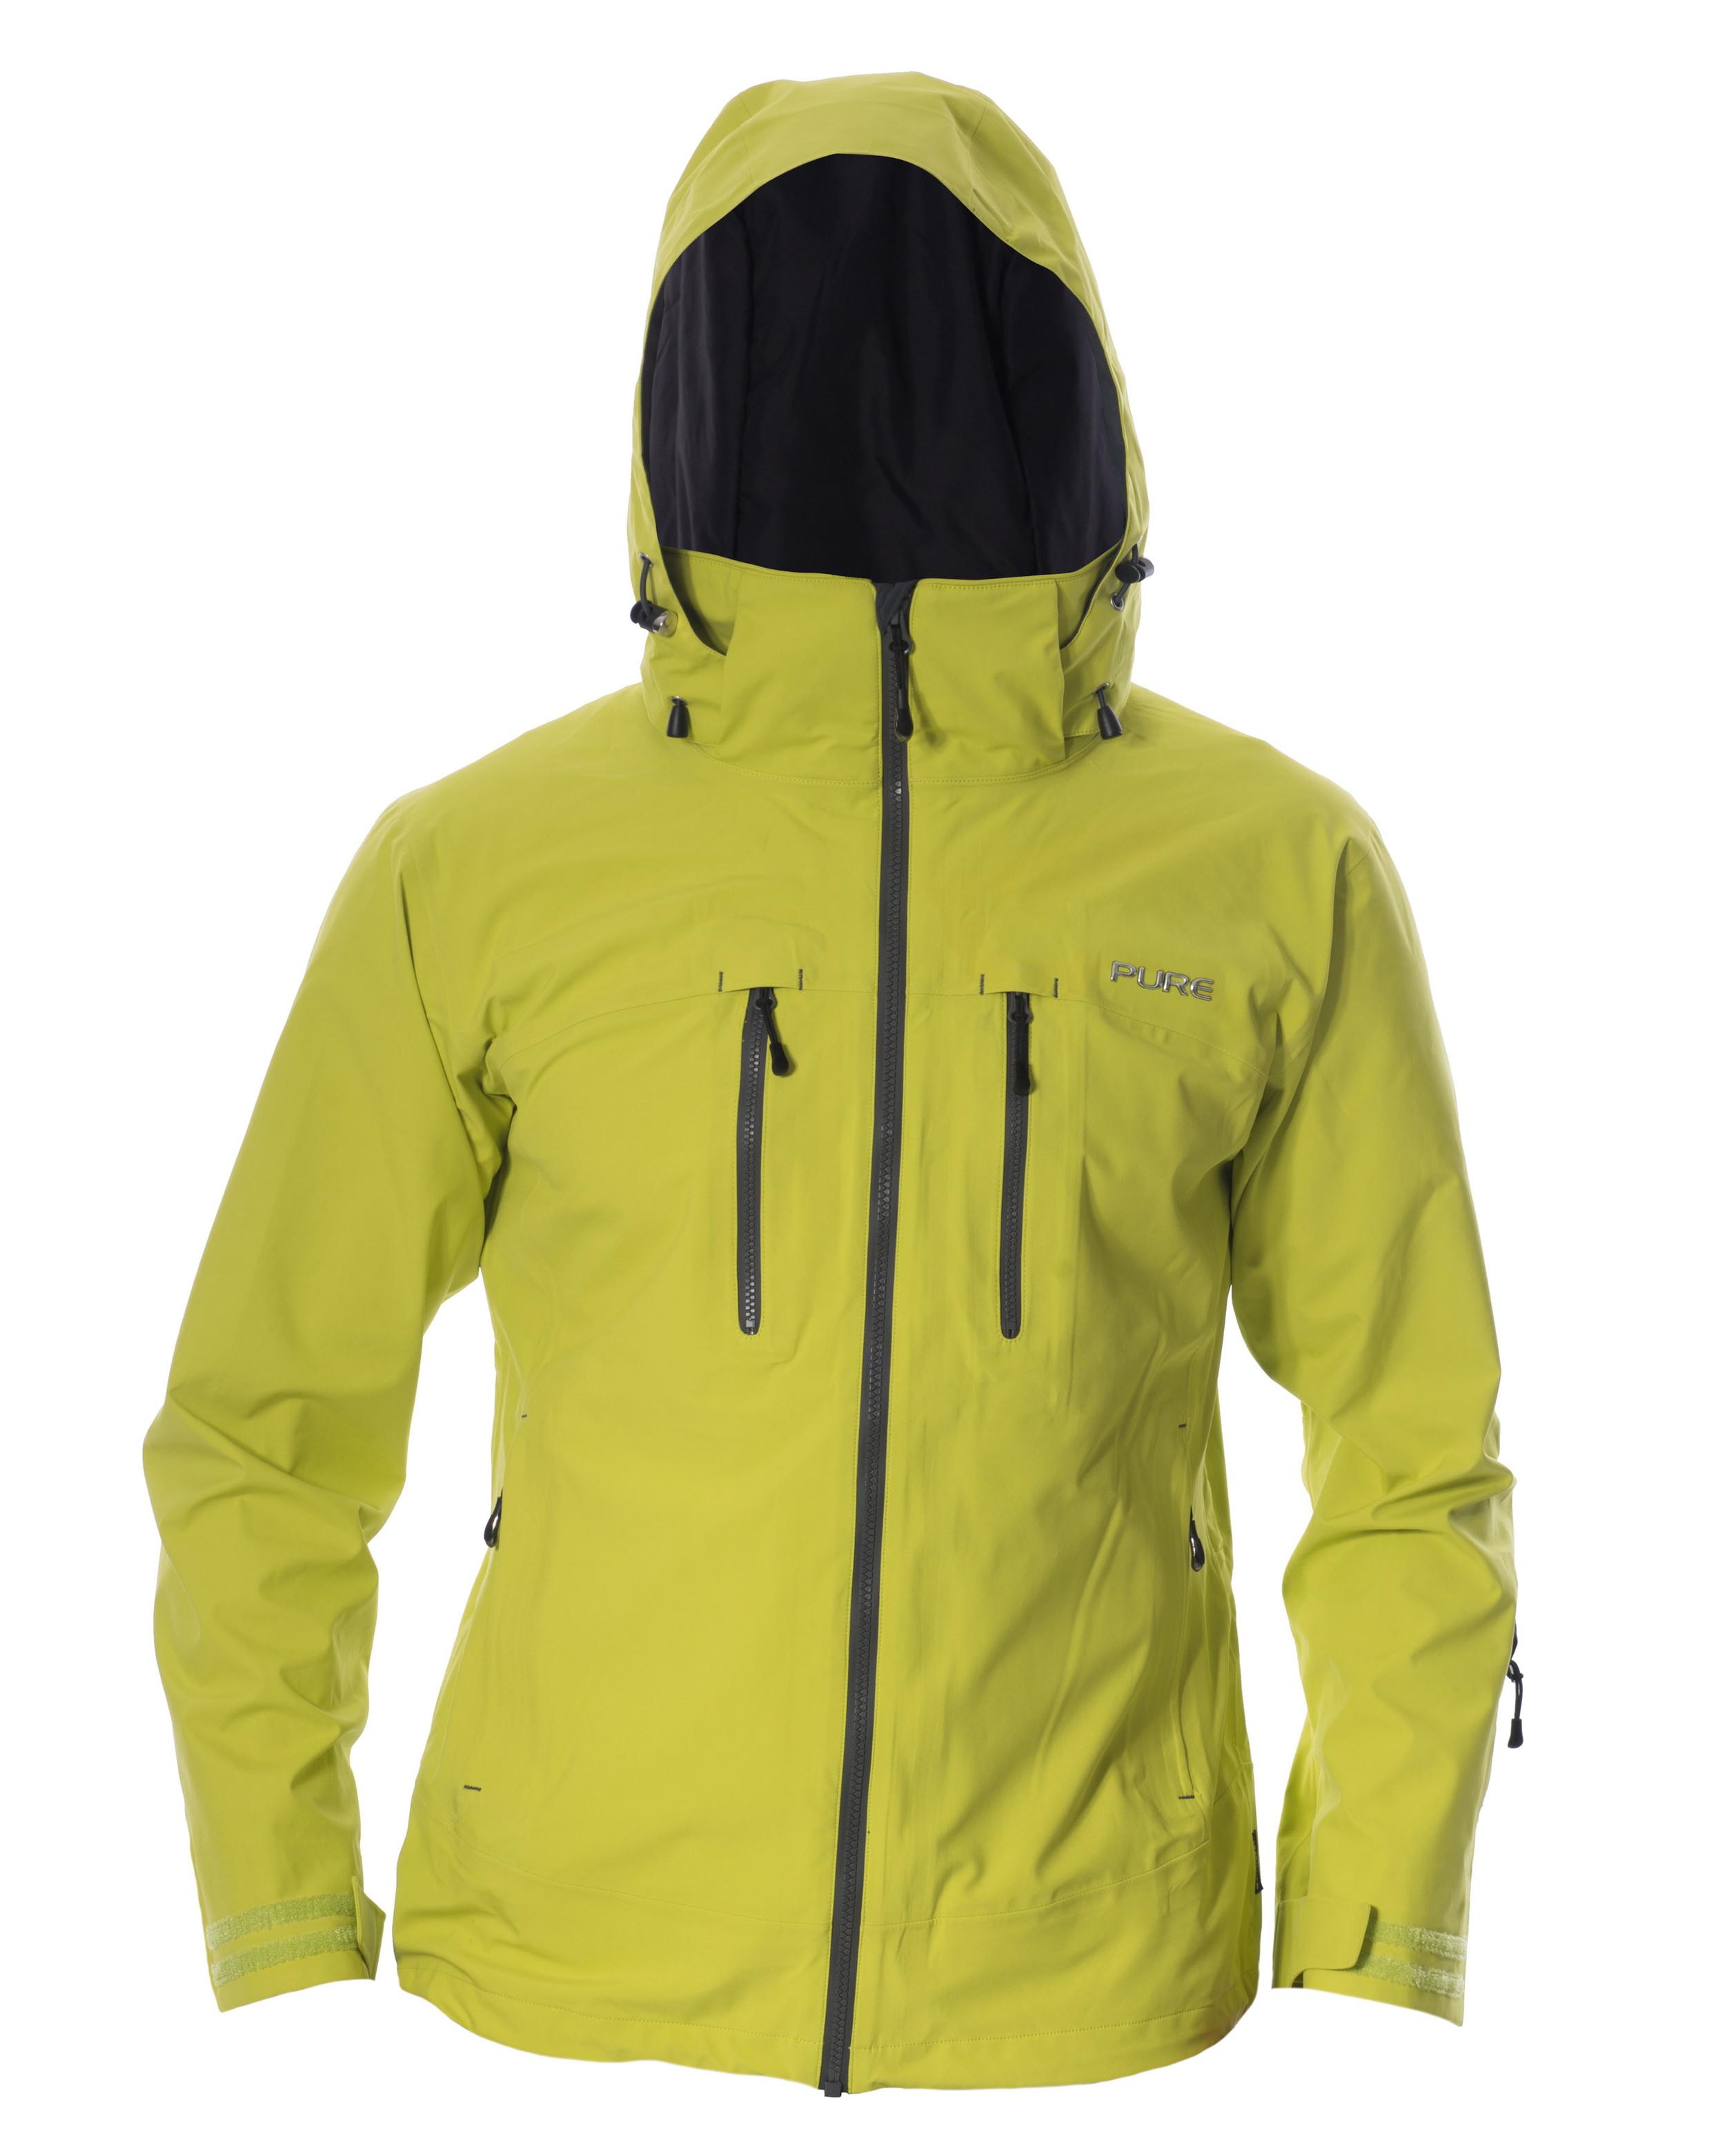 Copy of Everest Men's Jacket - Lime / Ebony Zips